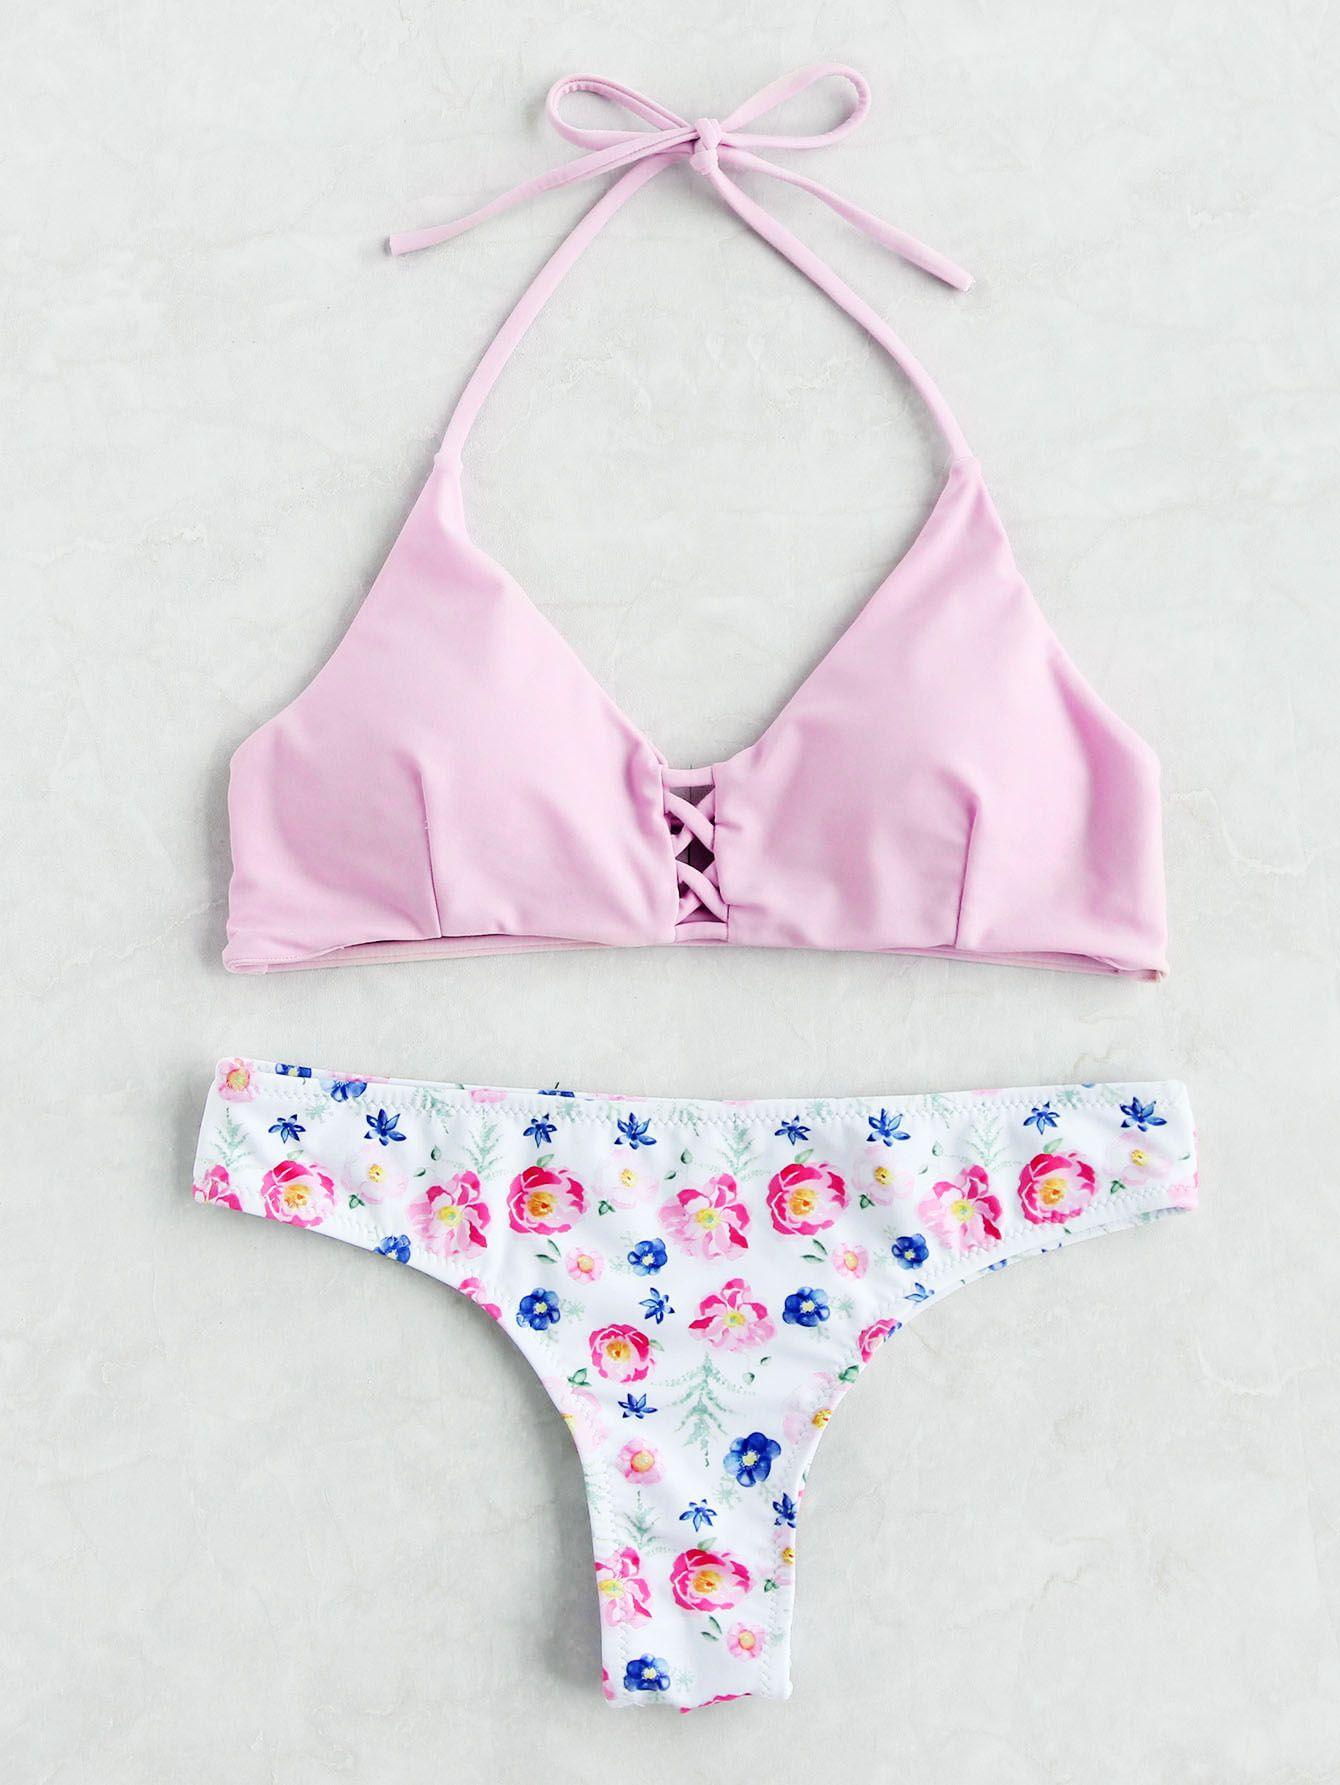 8808020b67 Shop Calico Print Criss Cross Bikini Set online. SheIn offers Calico Print  Criss Cross Bikini Set & more to fit your fashionable needs.